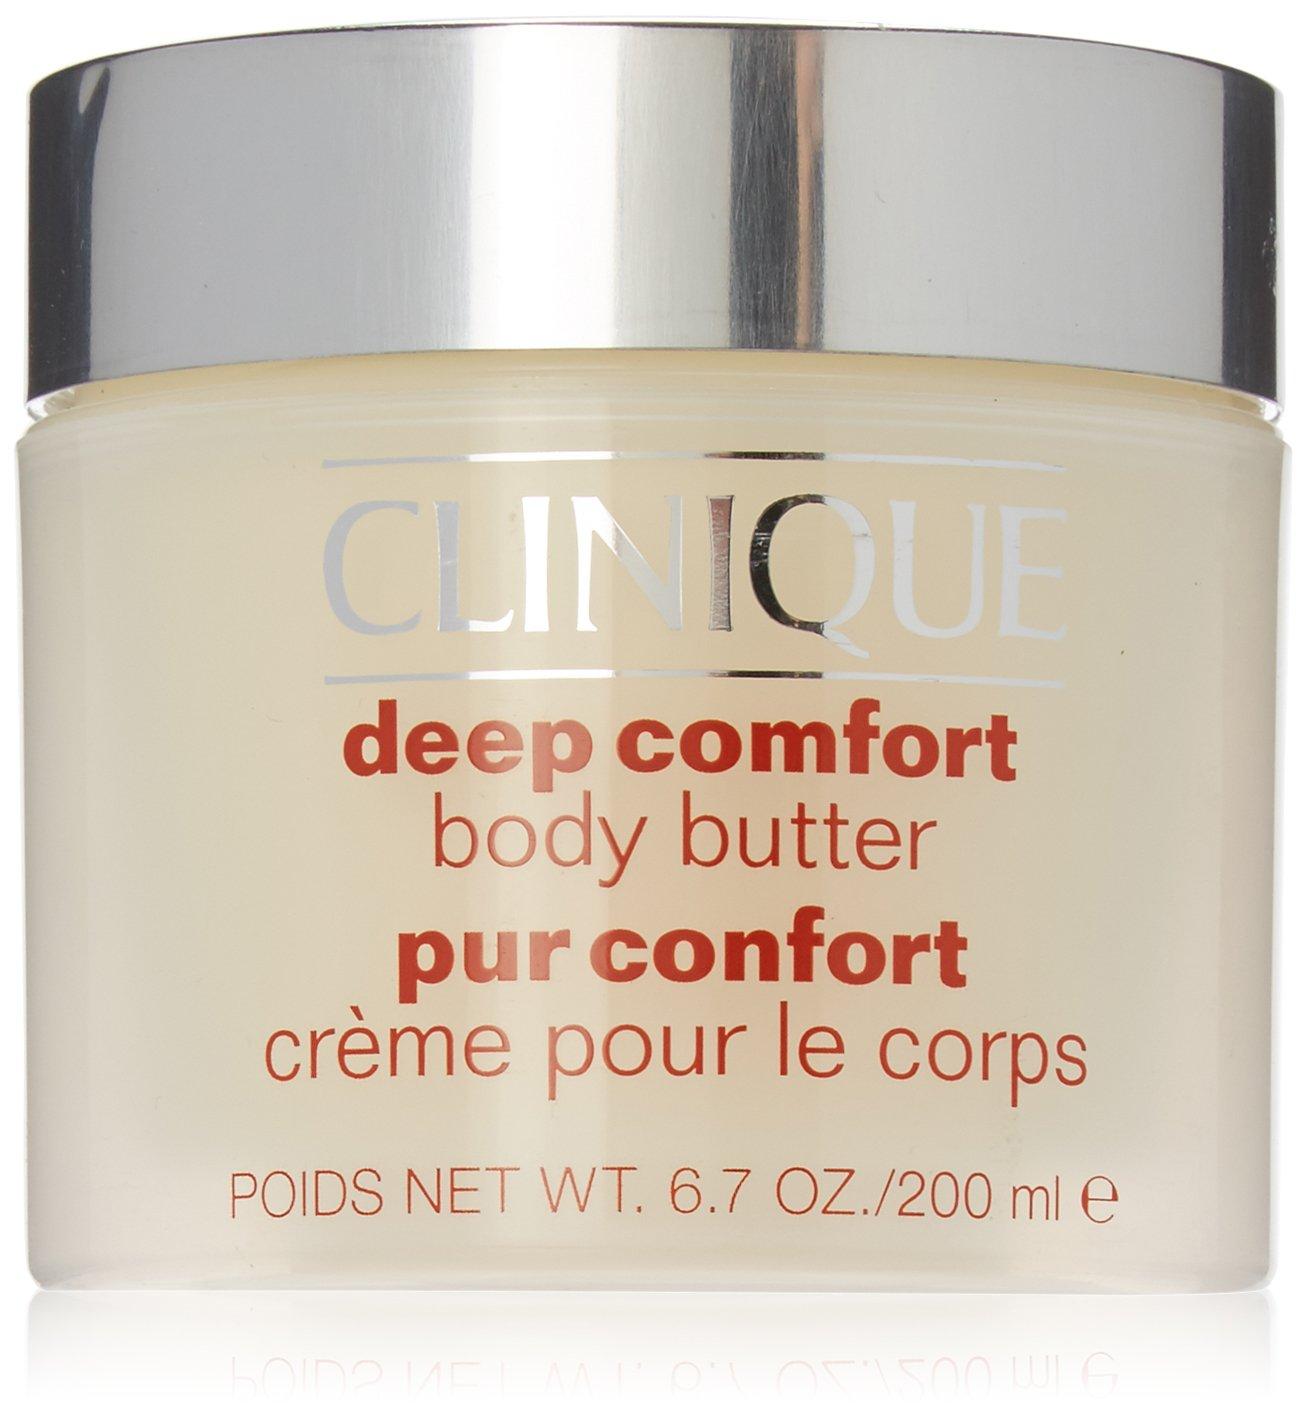 Clinique Deep Comfort Body Butter 6.7 oz / 200 mL : Cliniqe Body : Beauty